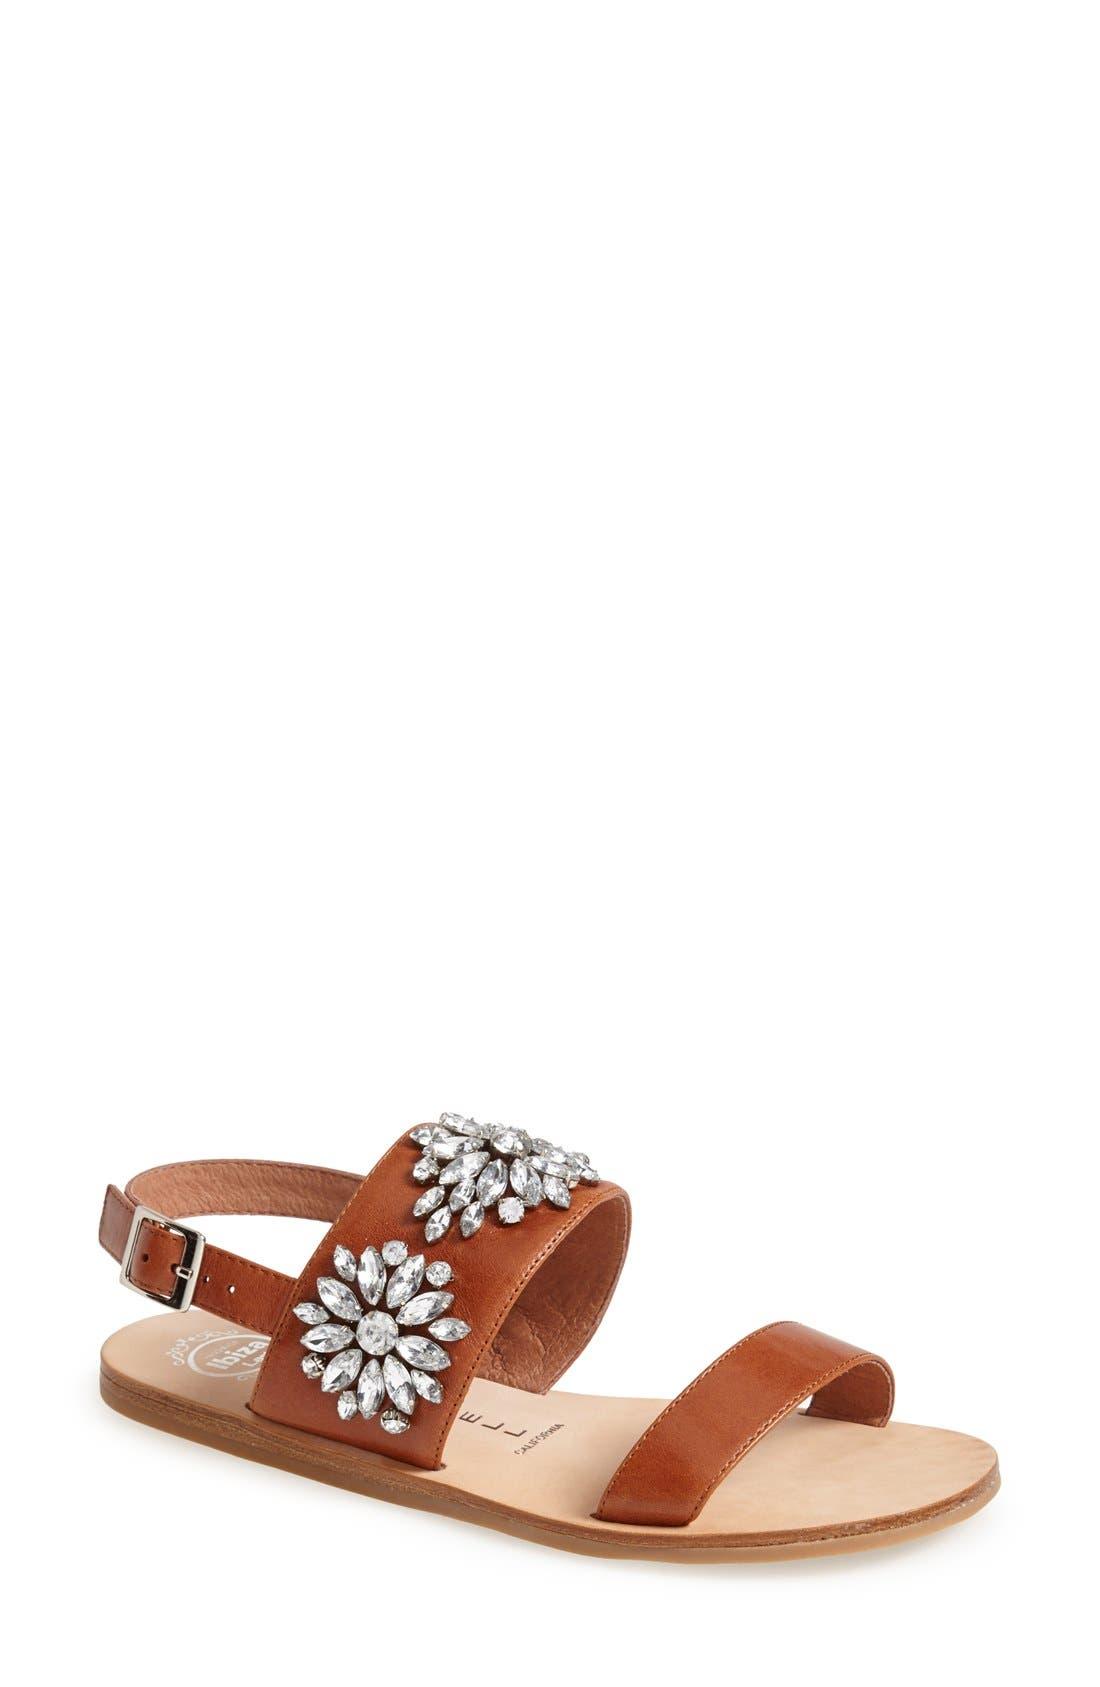 Alternate Image 1 Selected - Jeffrey Campbell 'Dola' Jeweled Leather Sandal (Women)